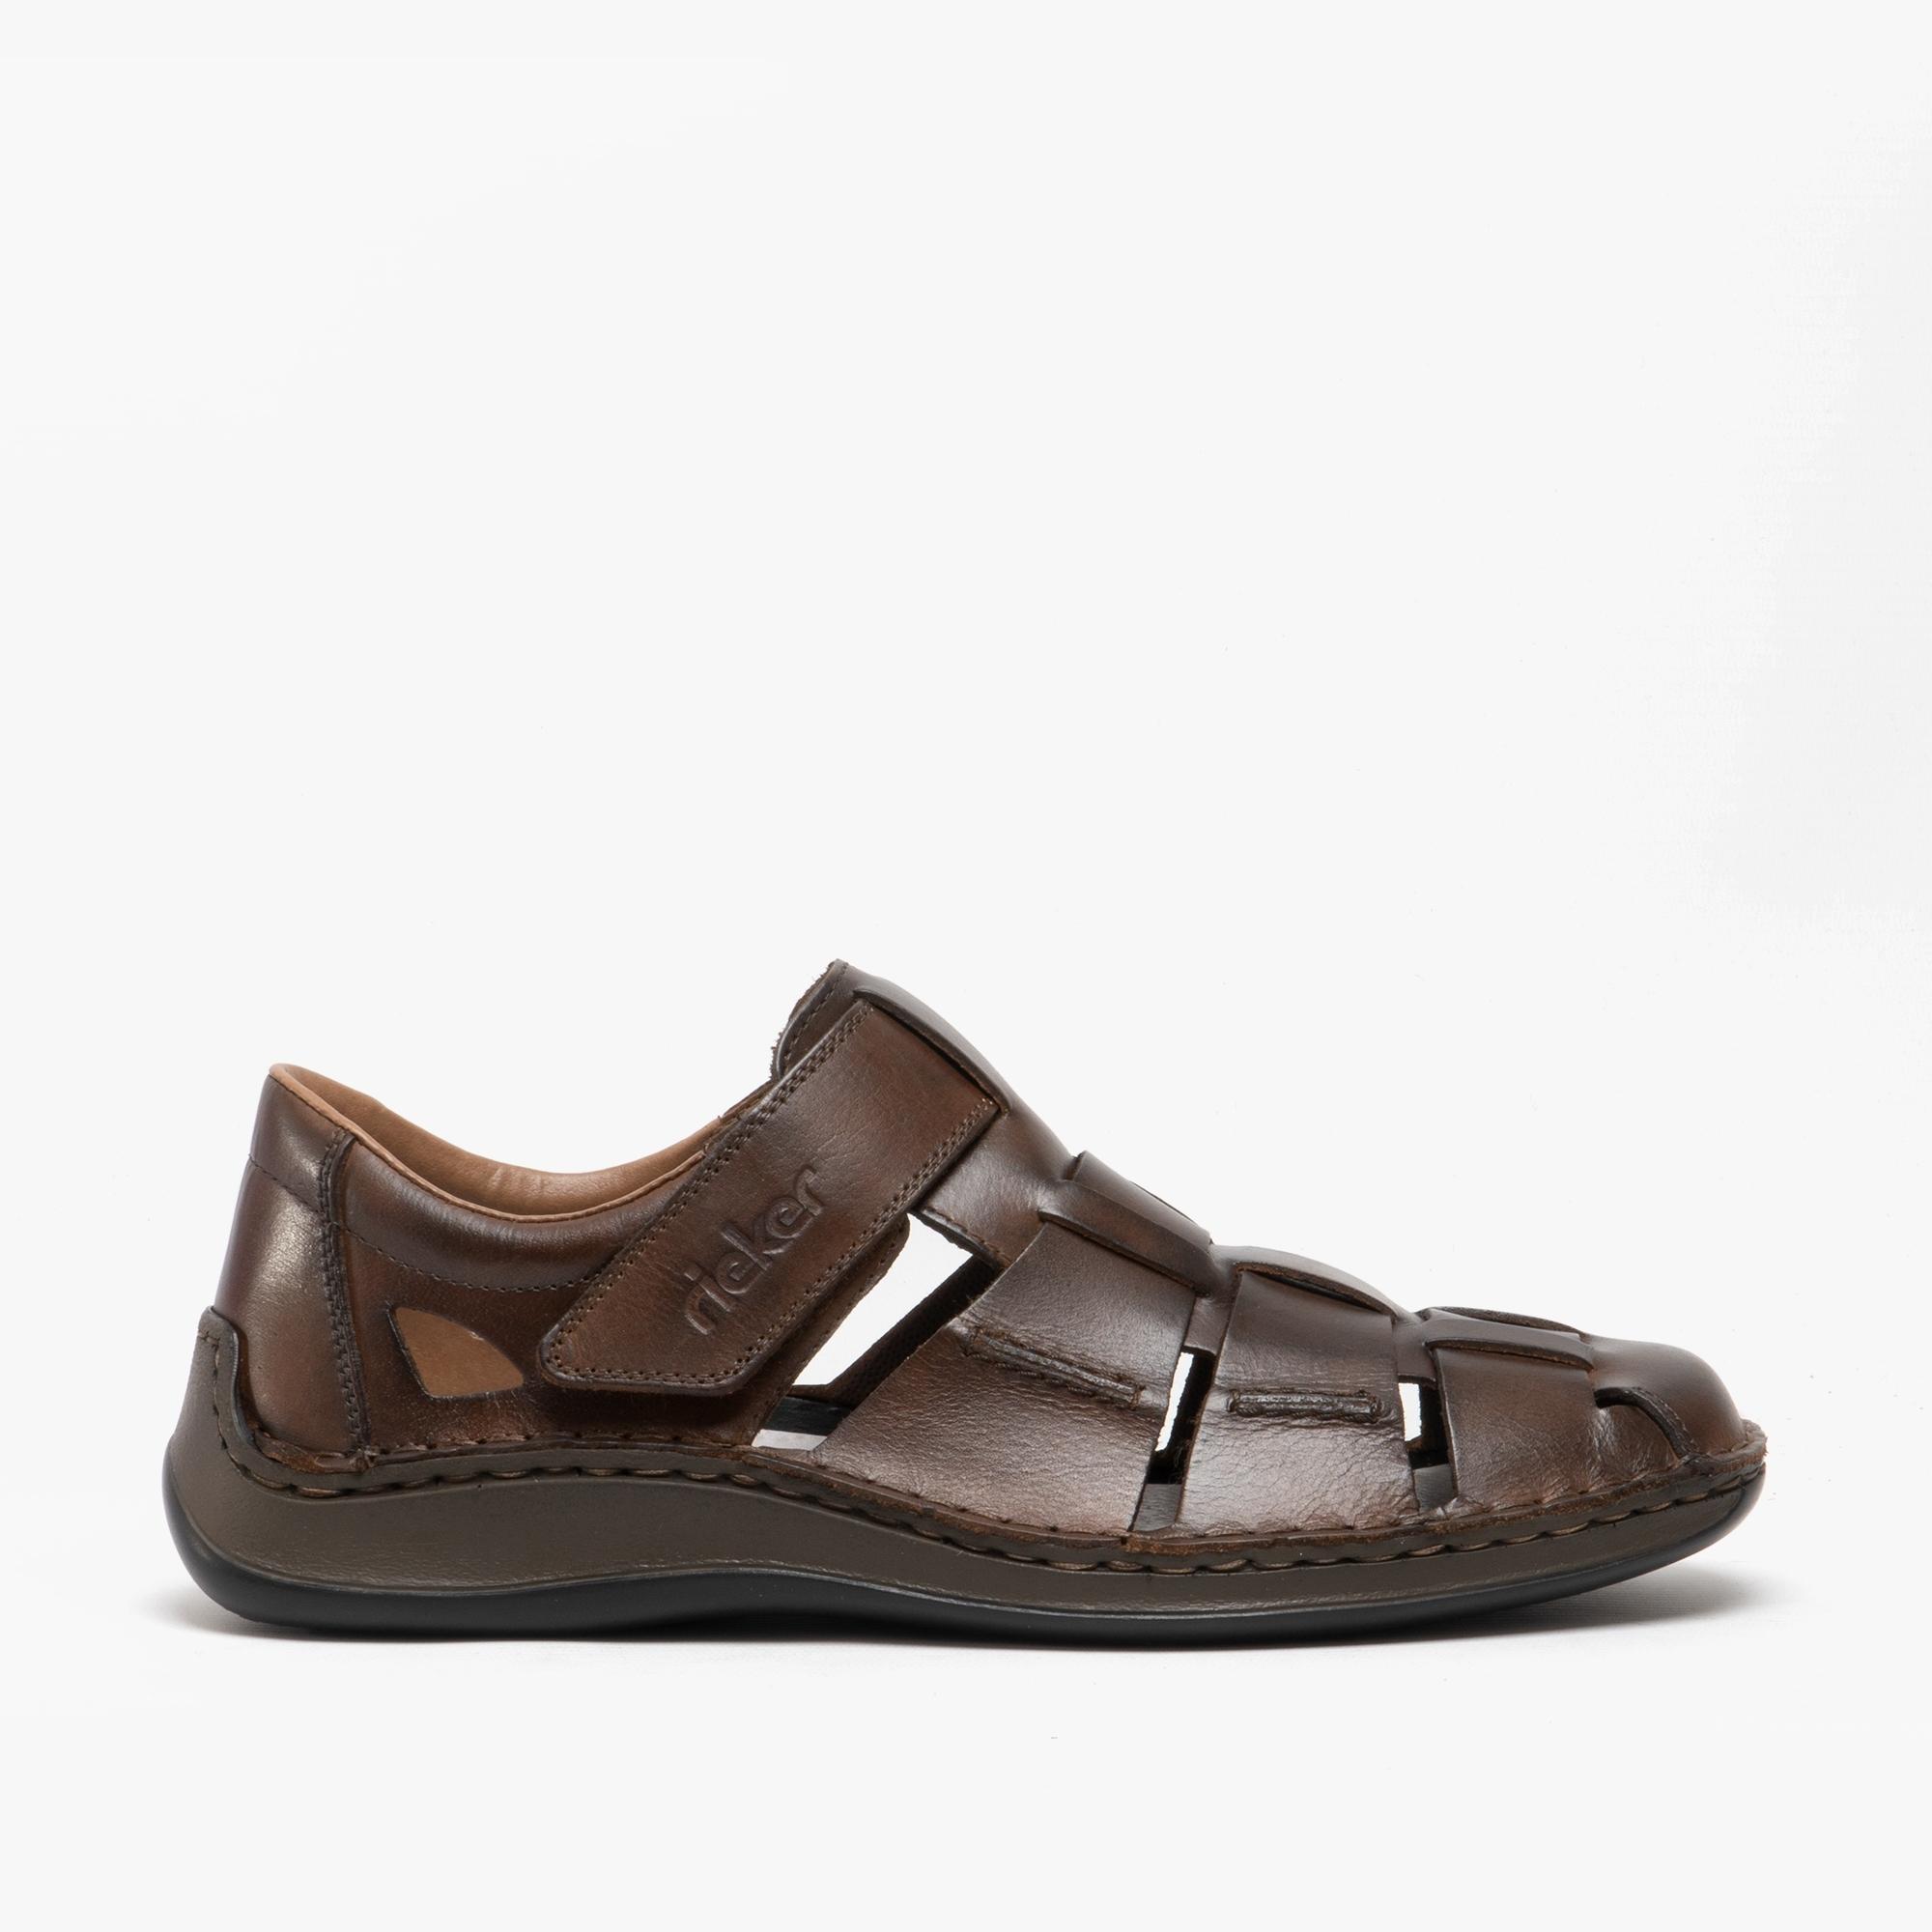 Summer Shoes Mens Rieker 05273-25 Brown Closed-Toe Sandals